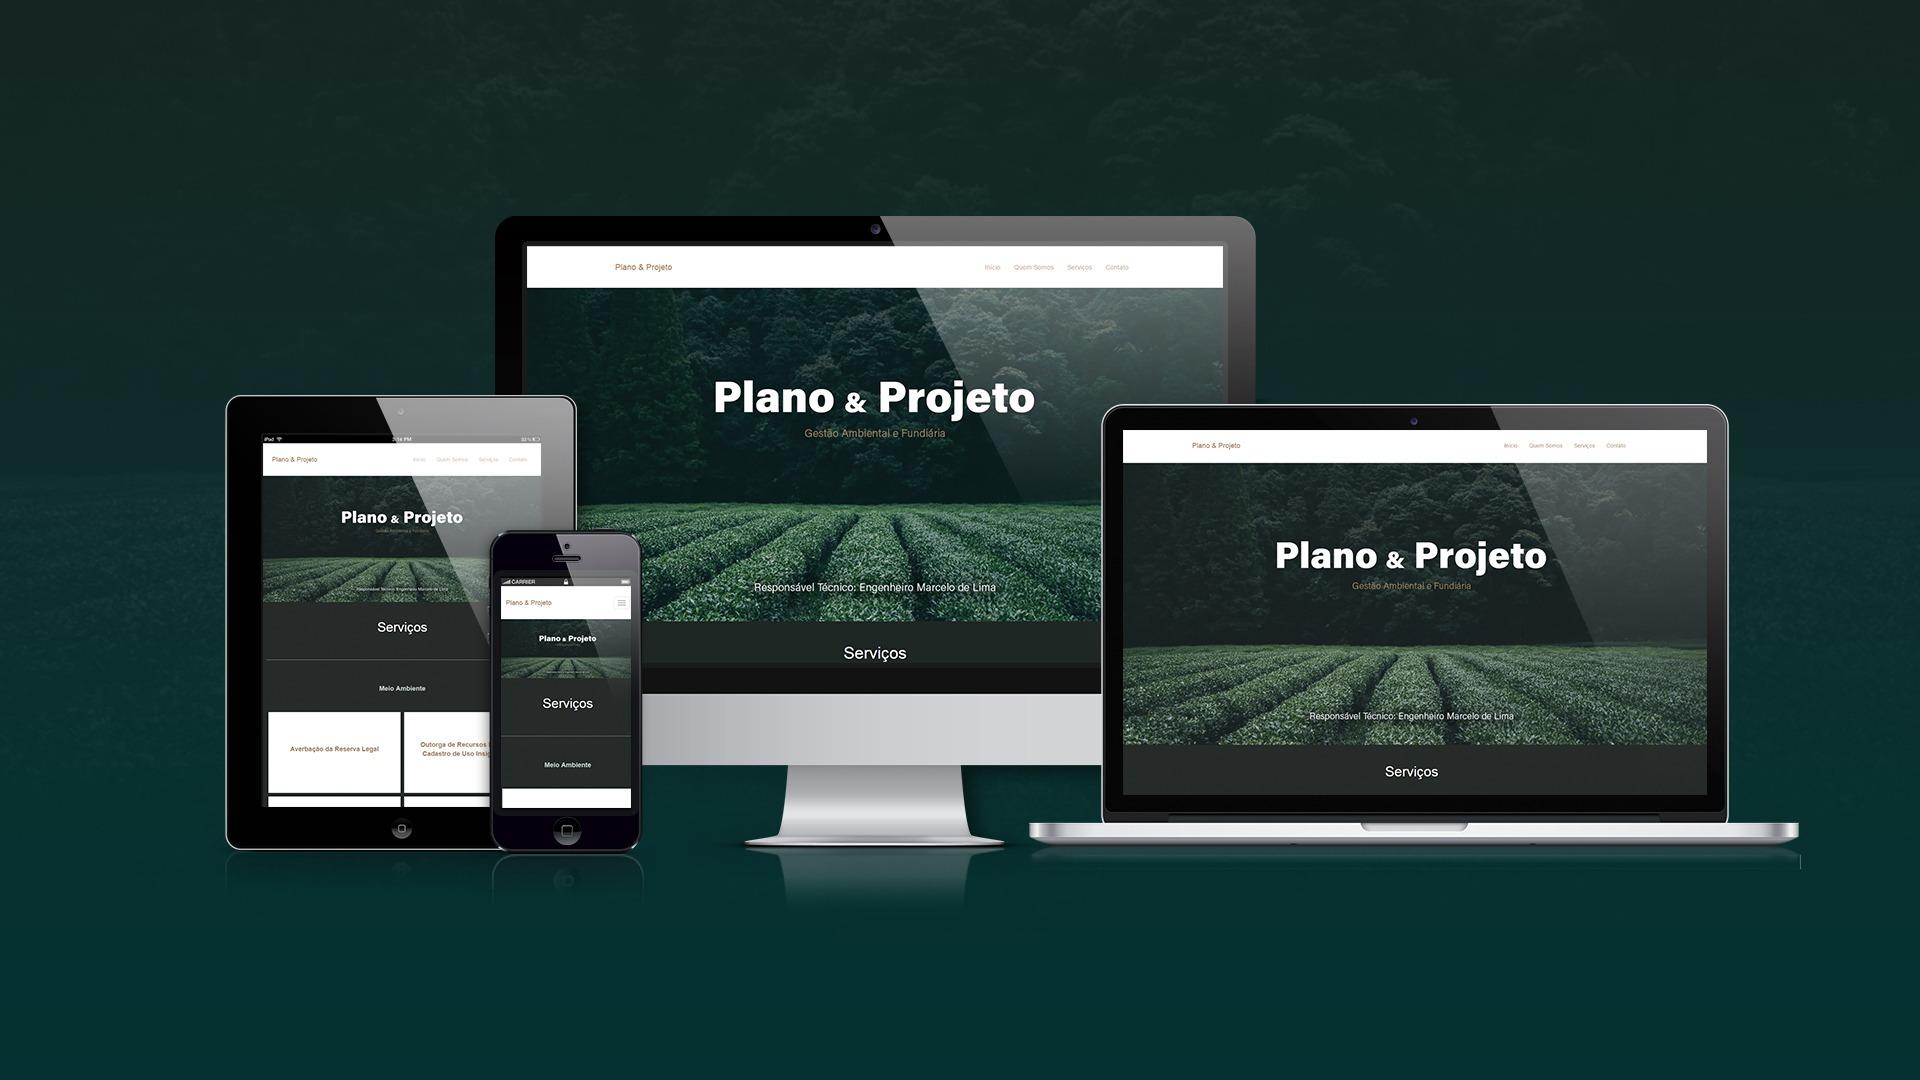 Plano e Projeto